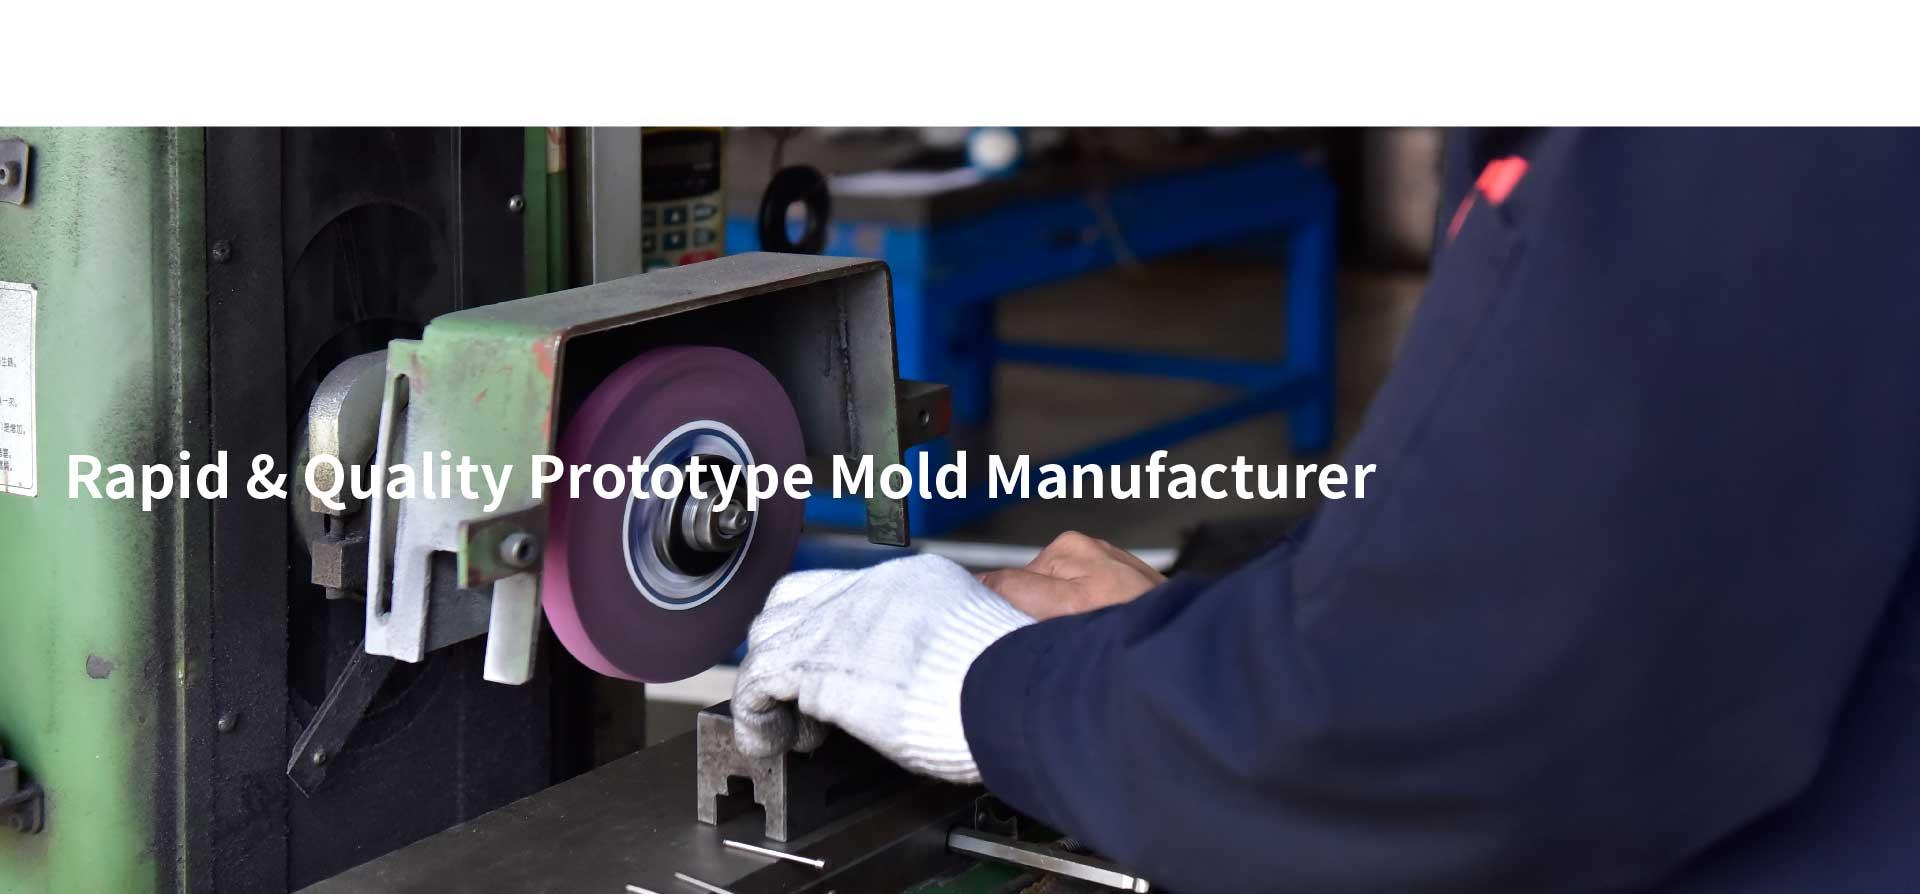 Prototype-Tooling-Manufacturer-BANNER